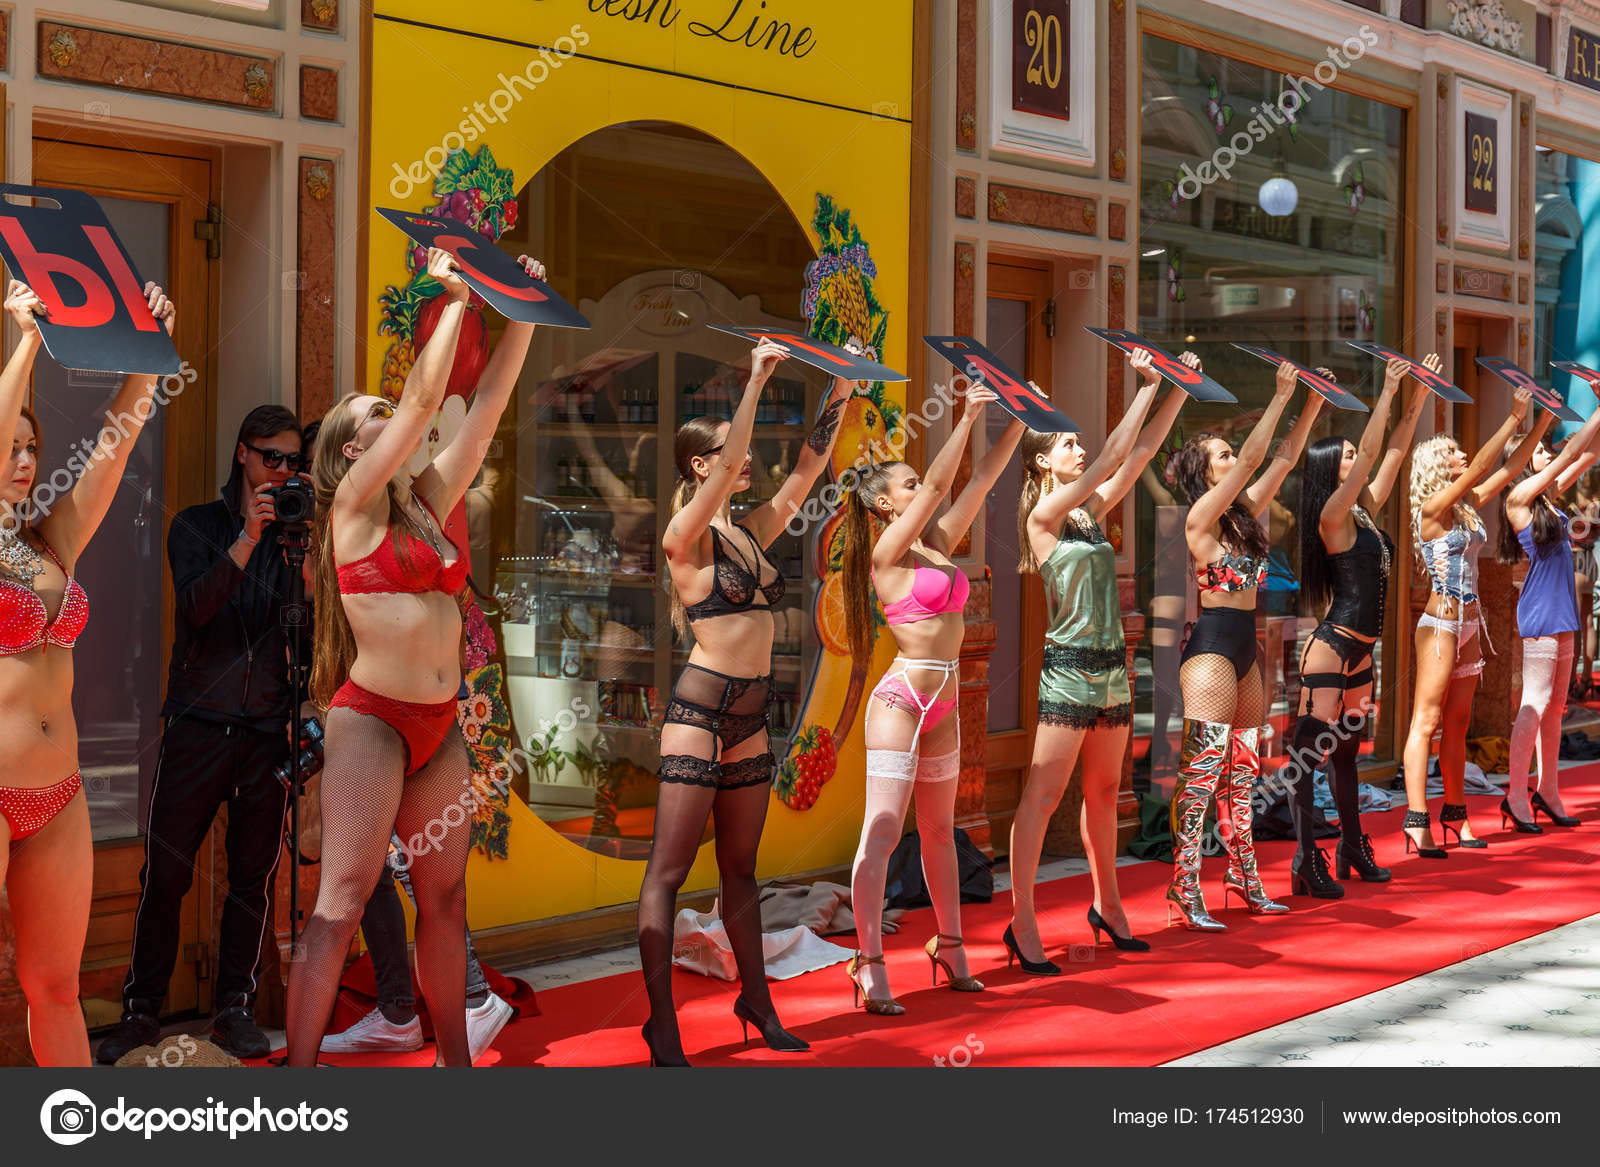 Saint Petersburg, Russia - Circa June 2017: Group of girls